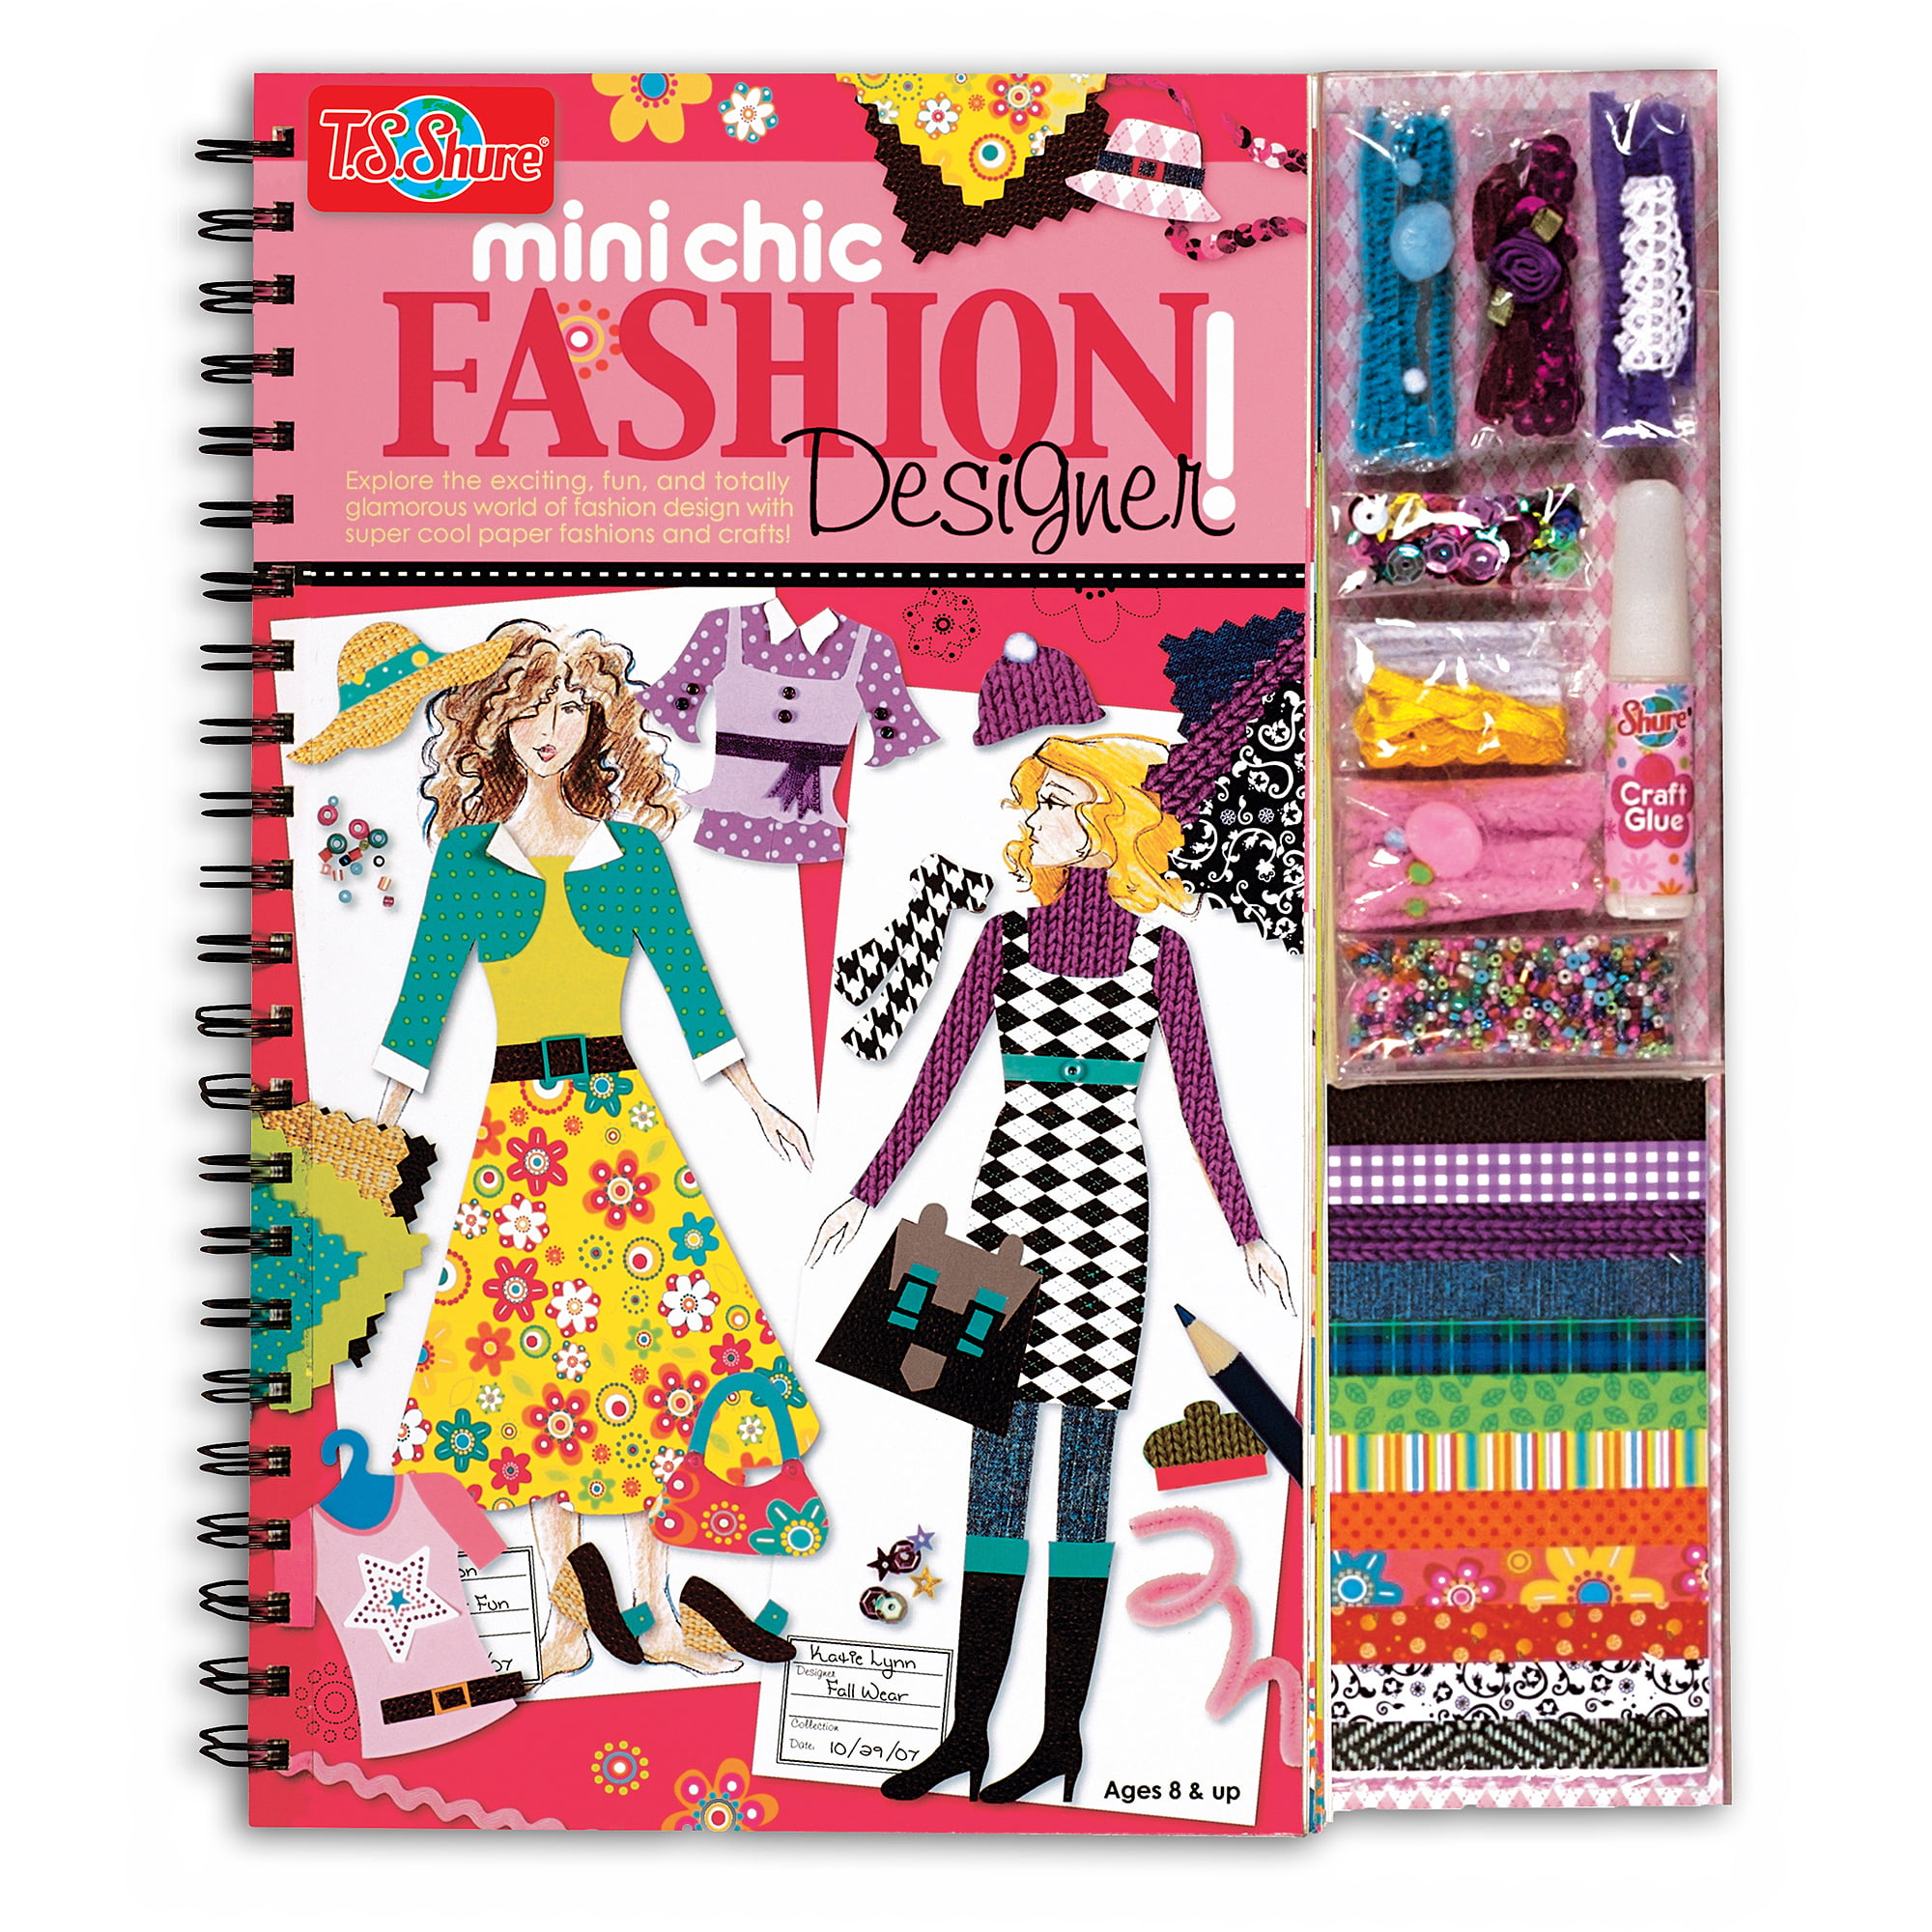 T S Shure Mini Chic Fashion Designer Book And Kit Walmart Com Walmart Com